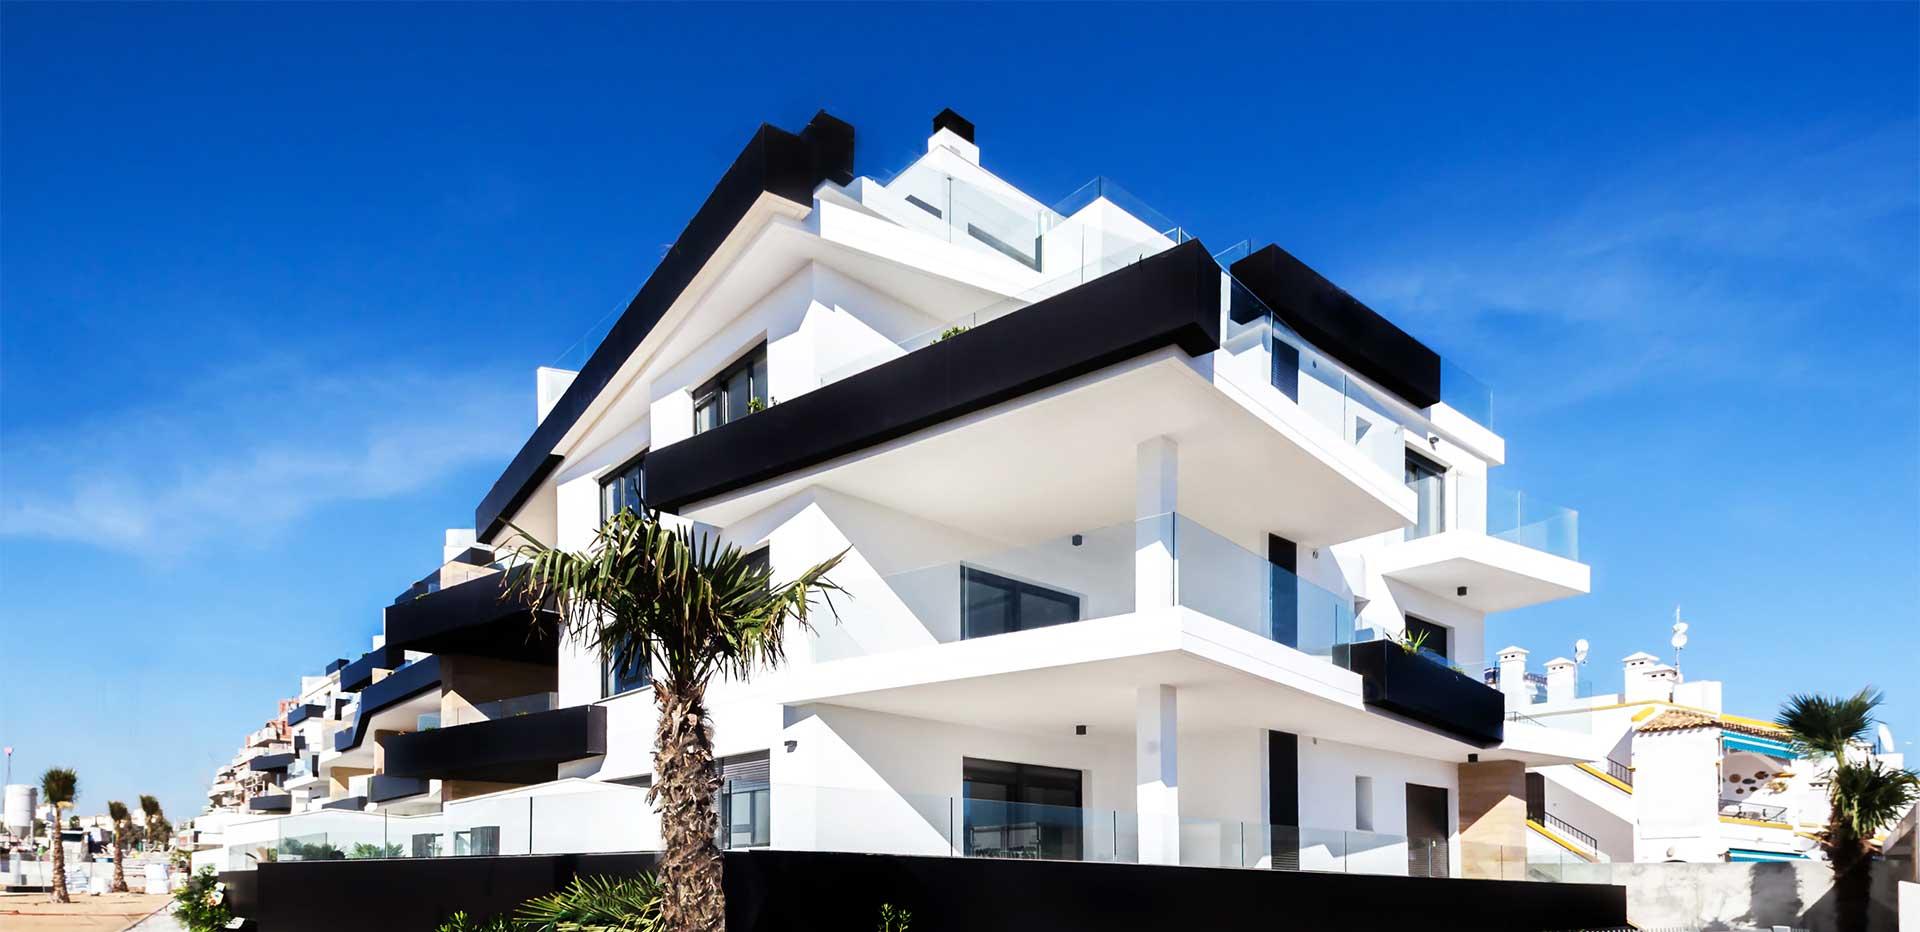 Acheter un bien immobilier à Maurice